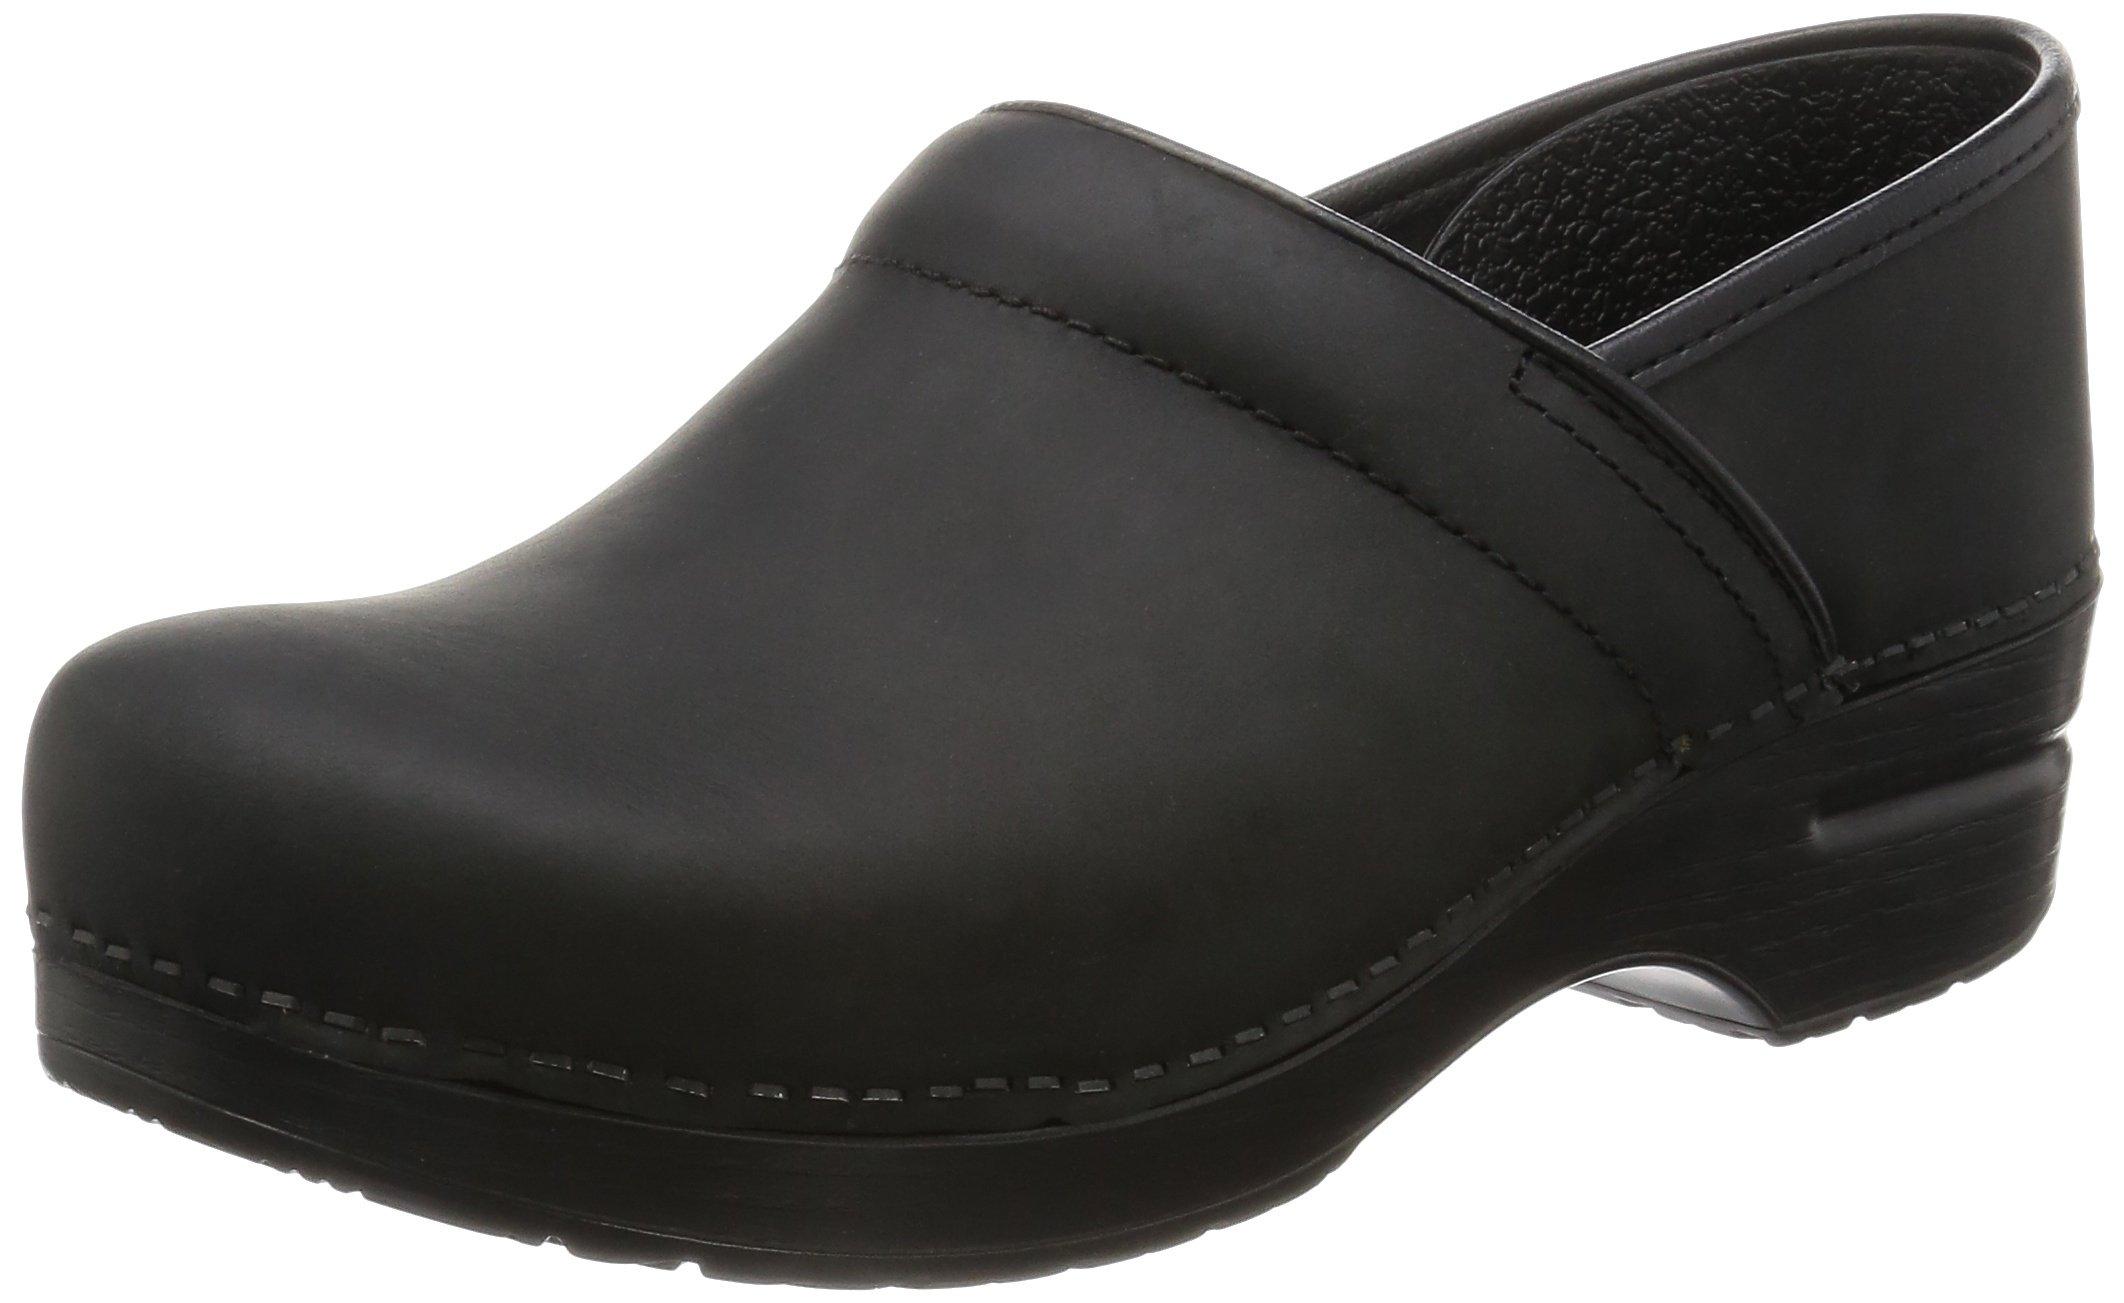 Dansko Women's Professional Mule,Black Oiled,38 EU/7.5-8 M US